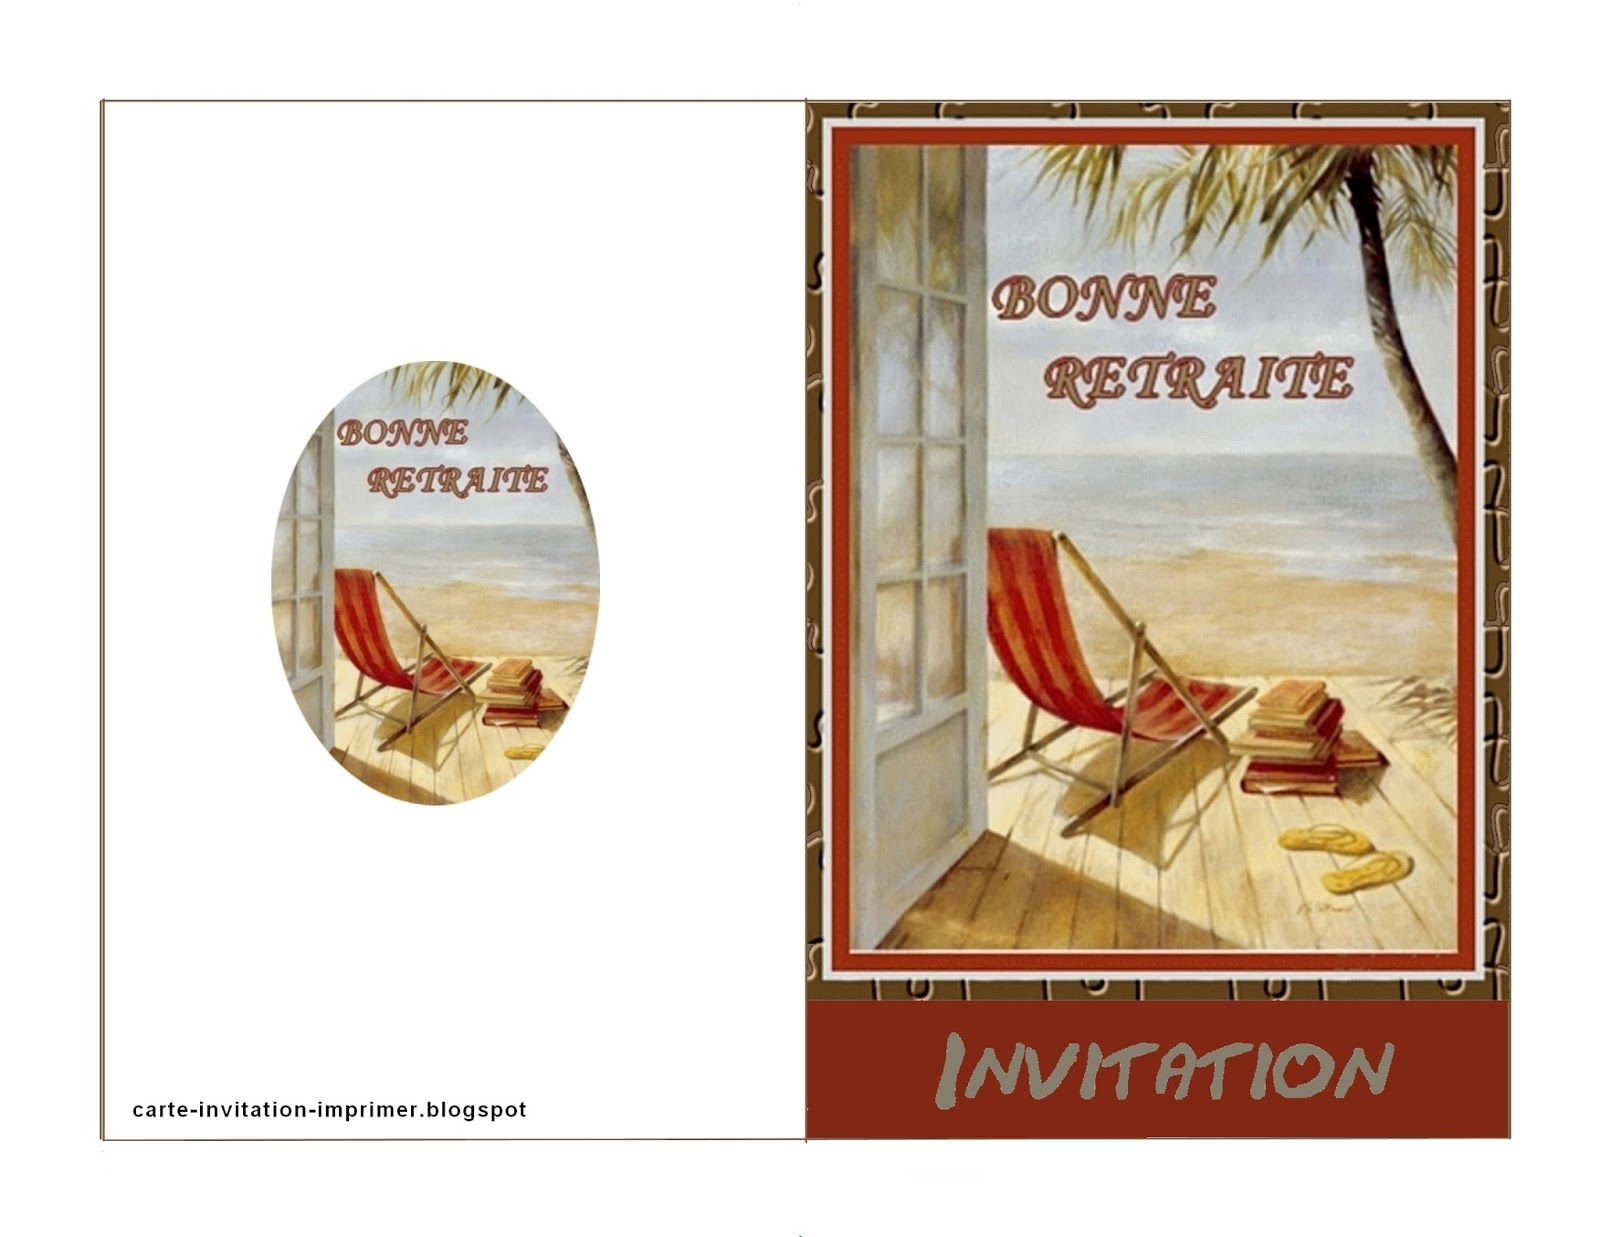 carte invitation imprimer gratuit carte invitation pour retraite imprimer gratuite. Black Bedroom Furniture Sets. Home Design Ideas